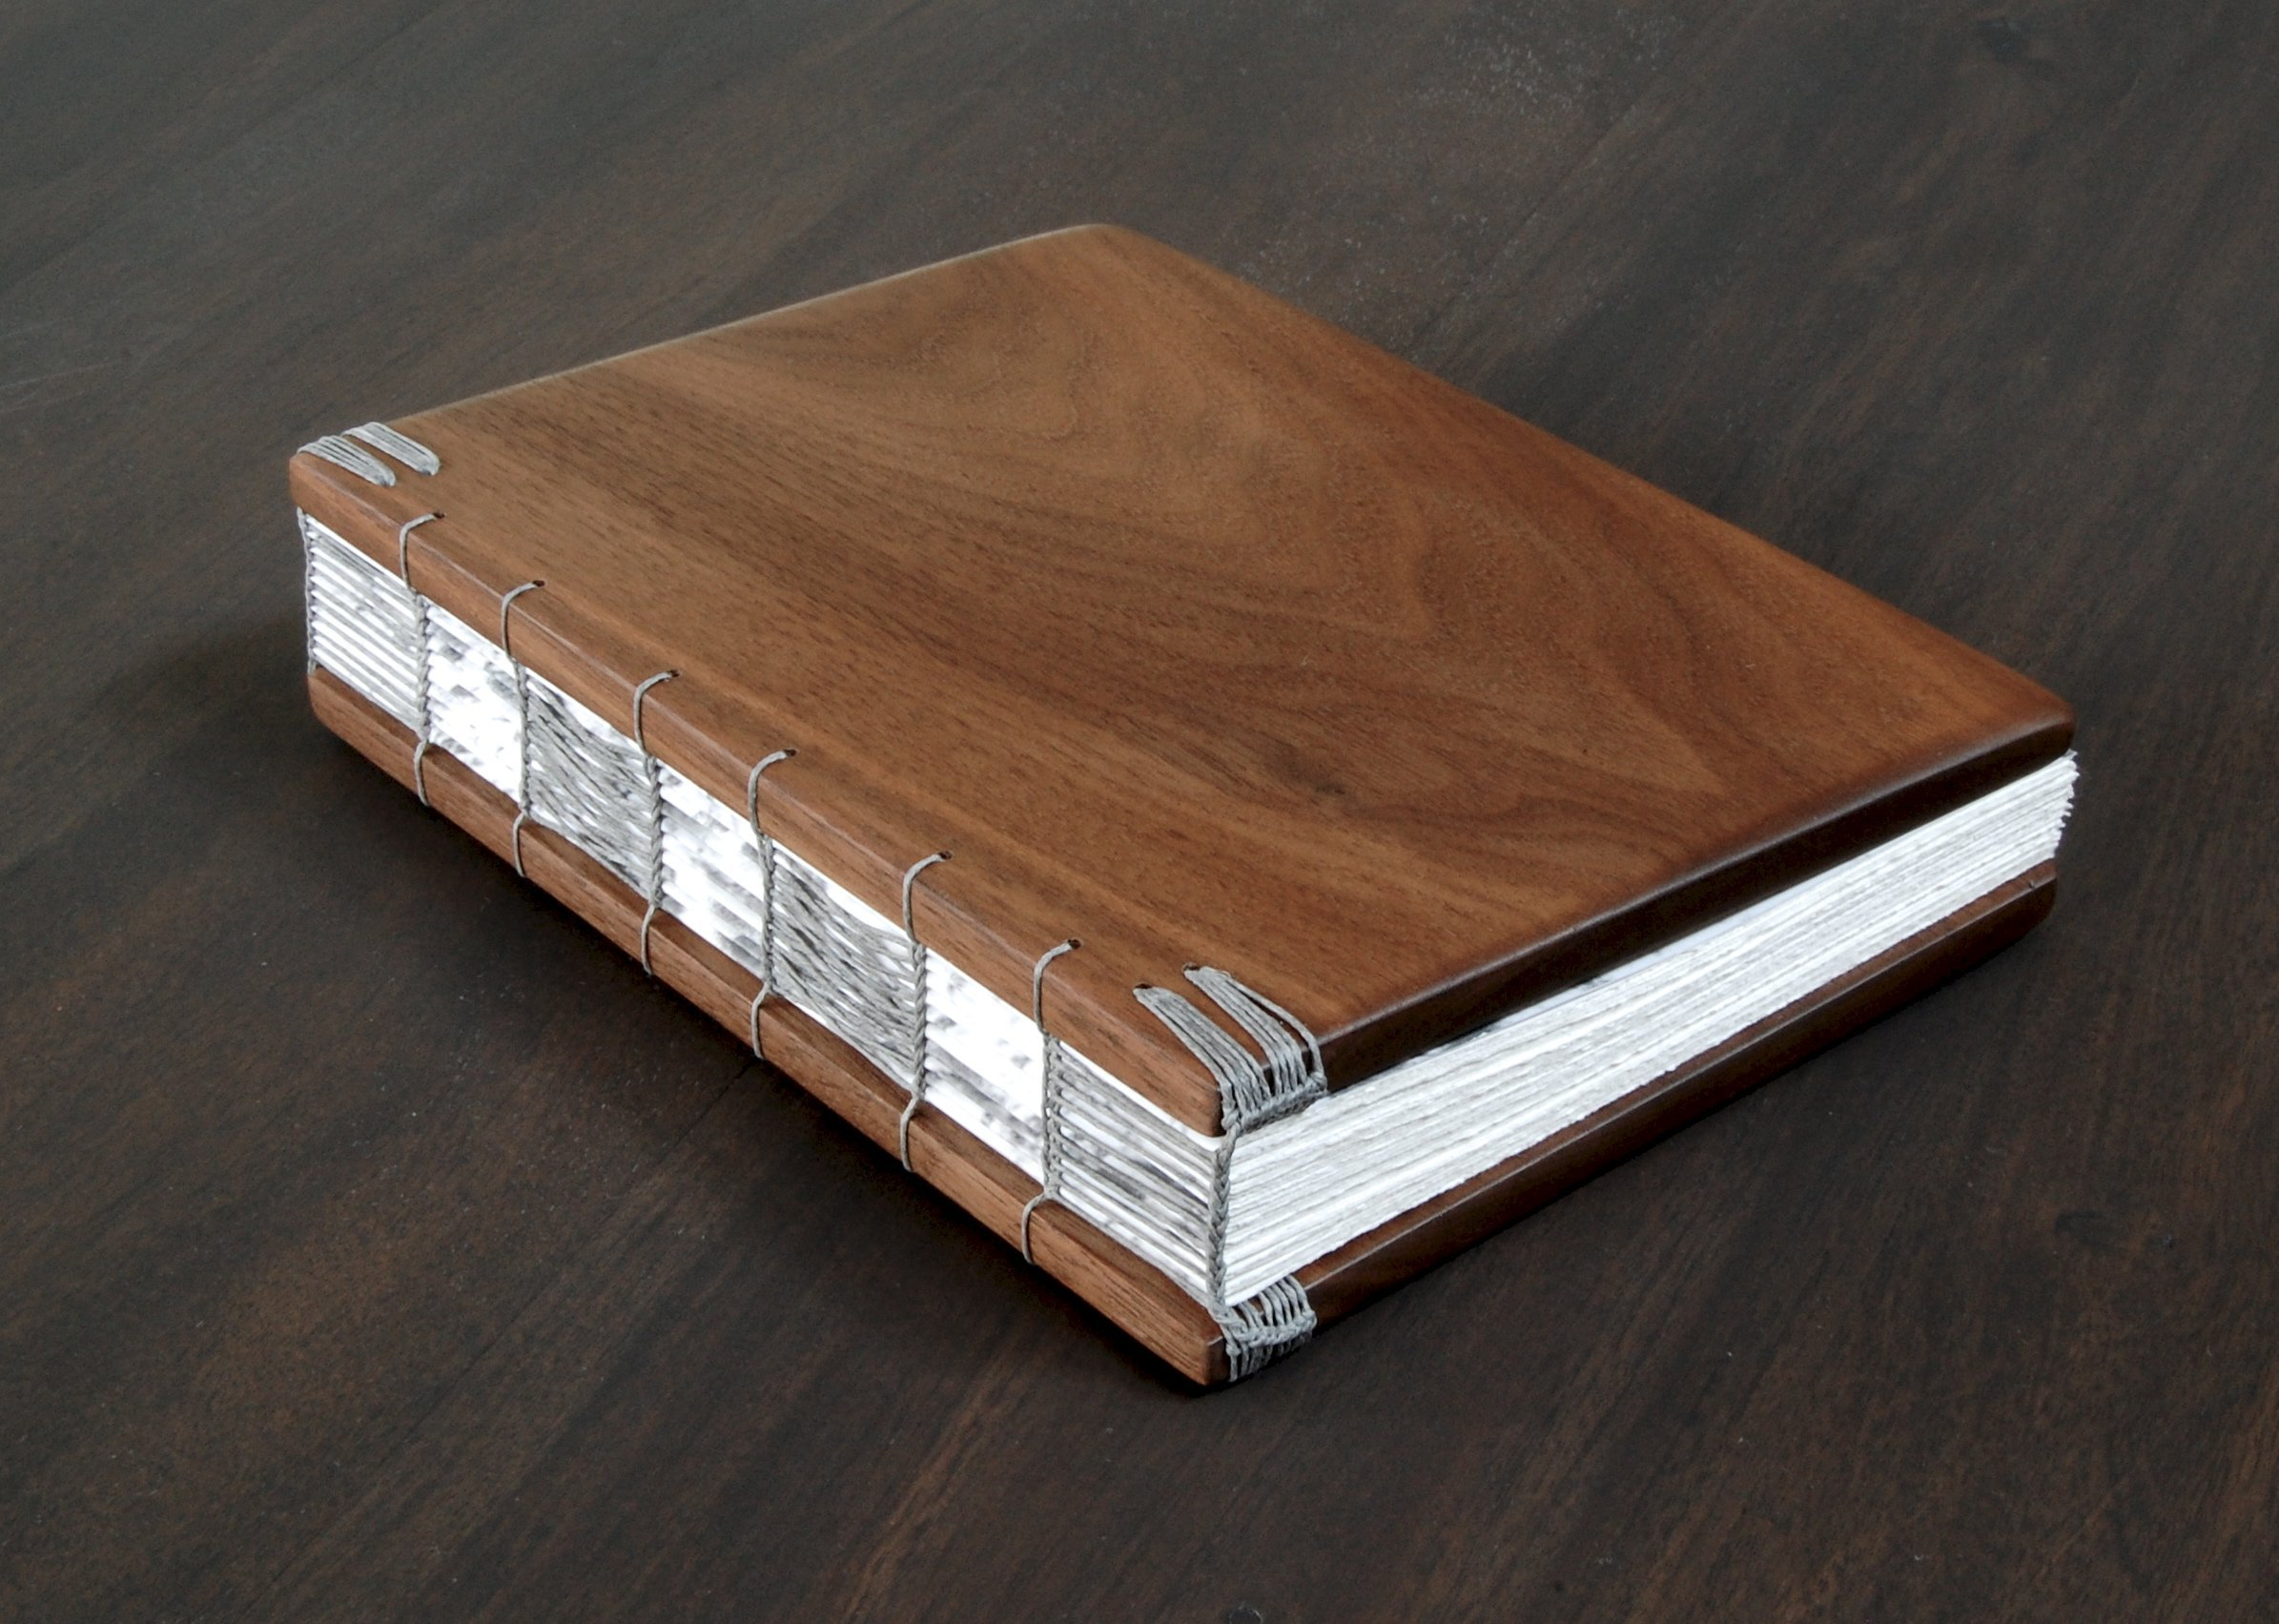 Handmade Wedding Guest Book or Journal - Black Walnut Wood